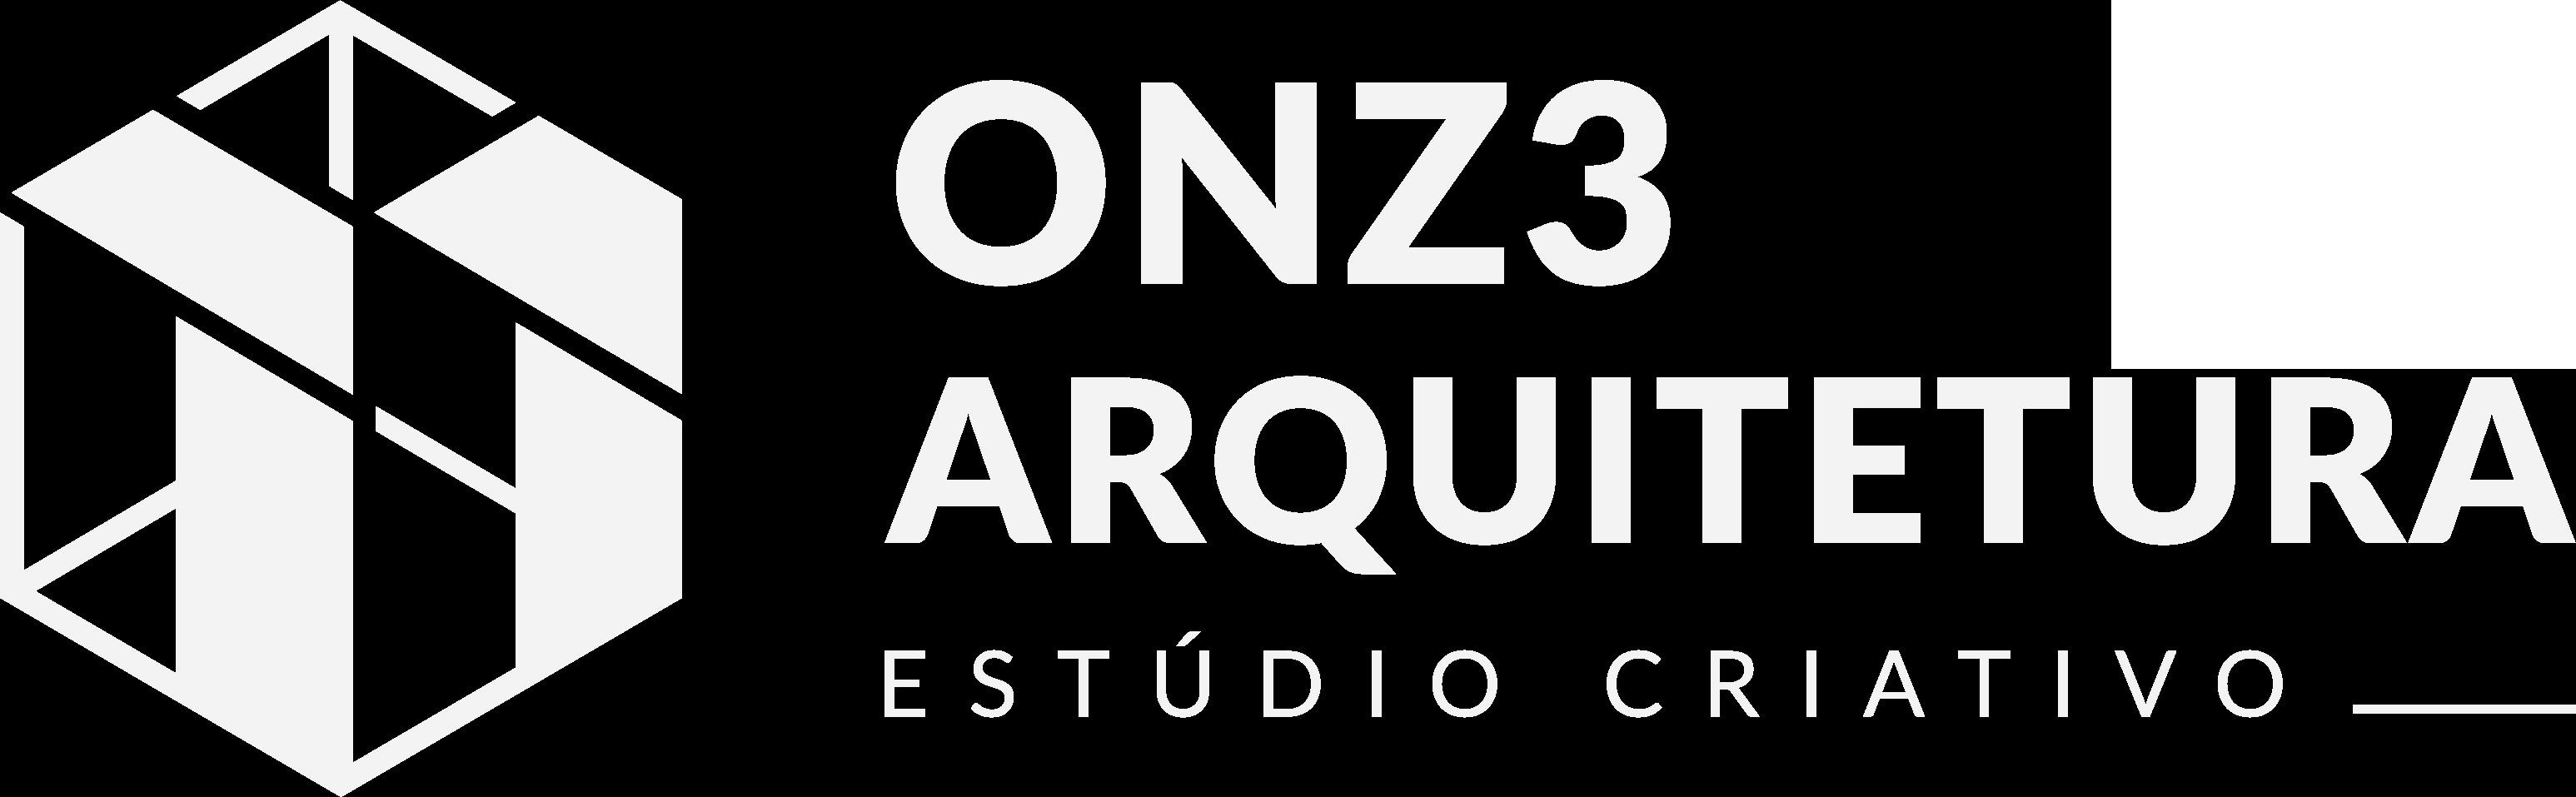 Onz3 Arquitetura